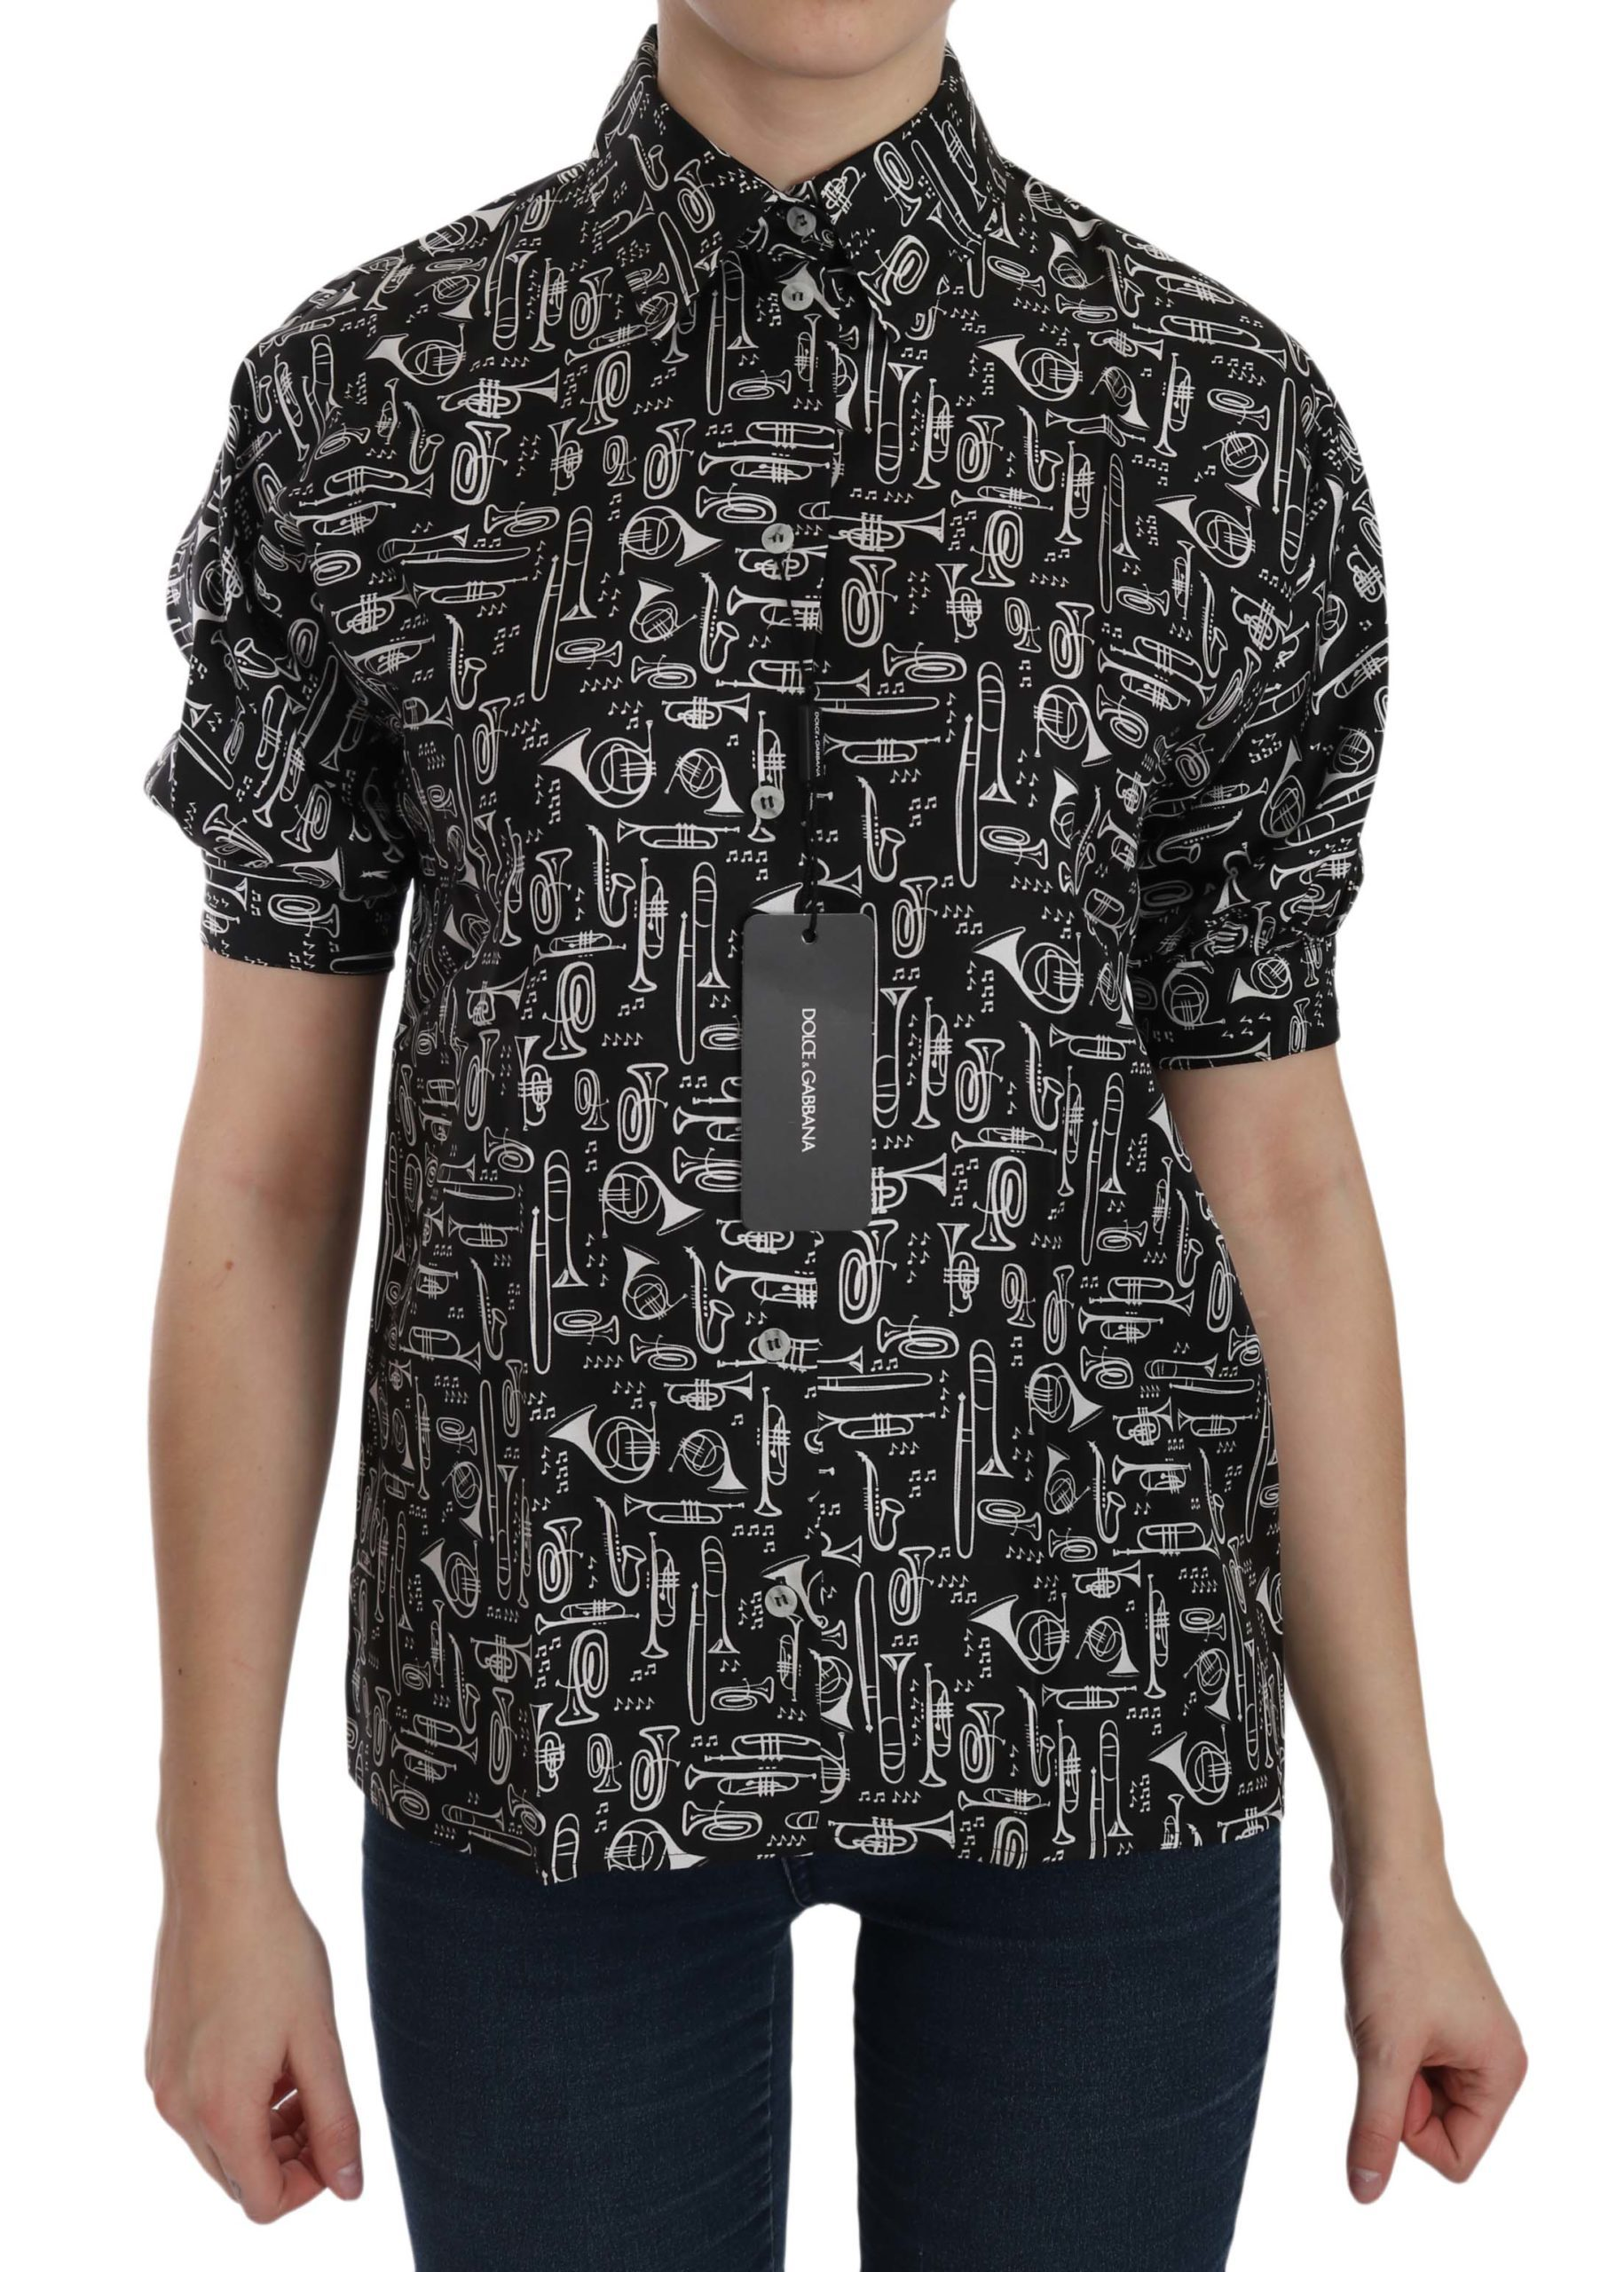 Dolce & Gabbana Women's Musical Instrument Collared Shirt Black TSH3115 - IT36|XXS